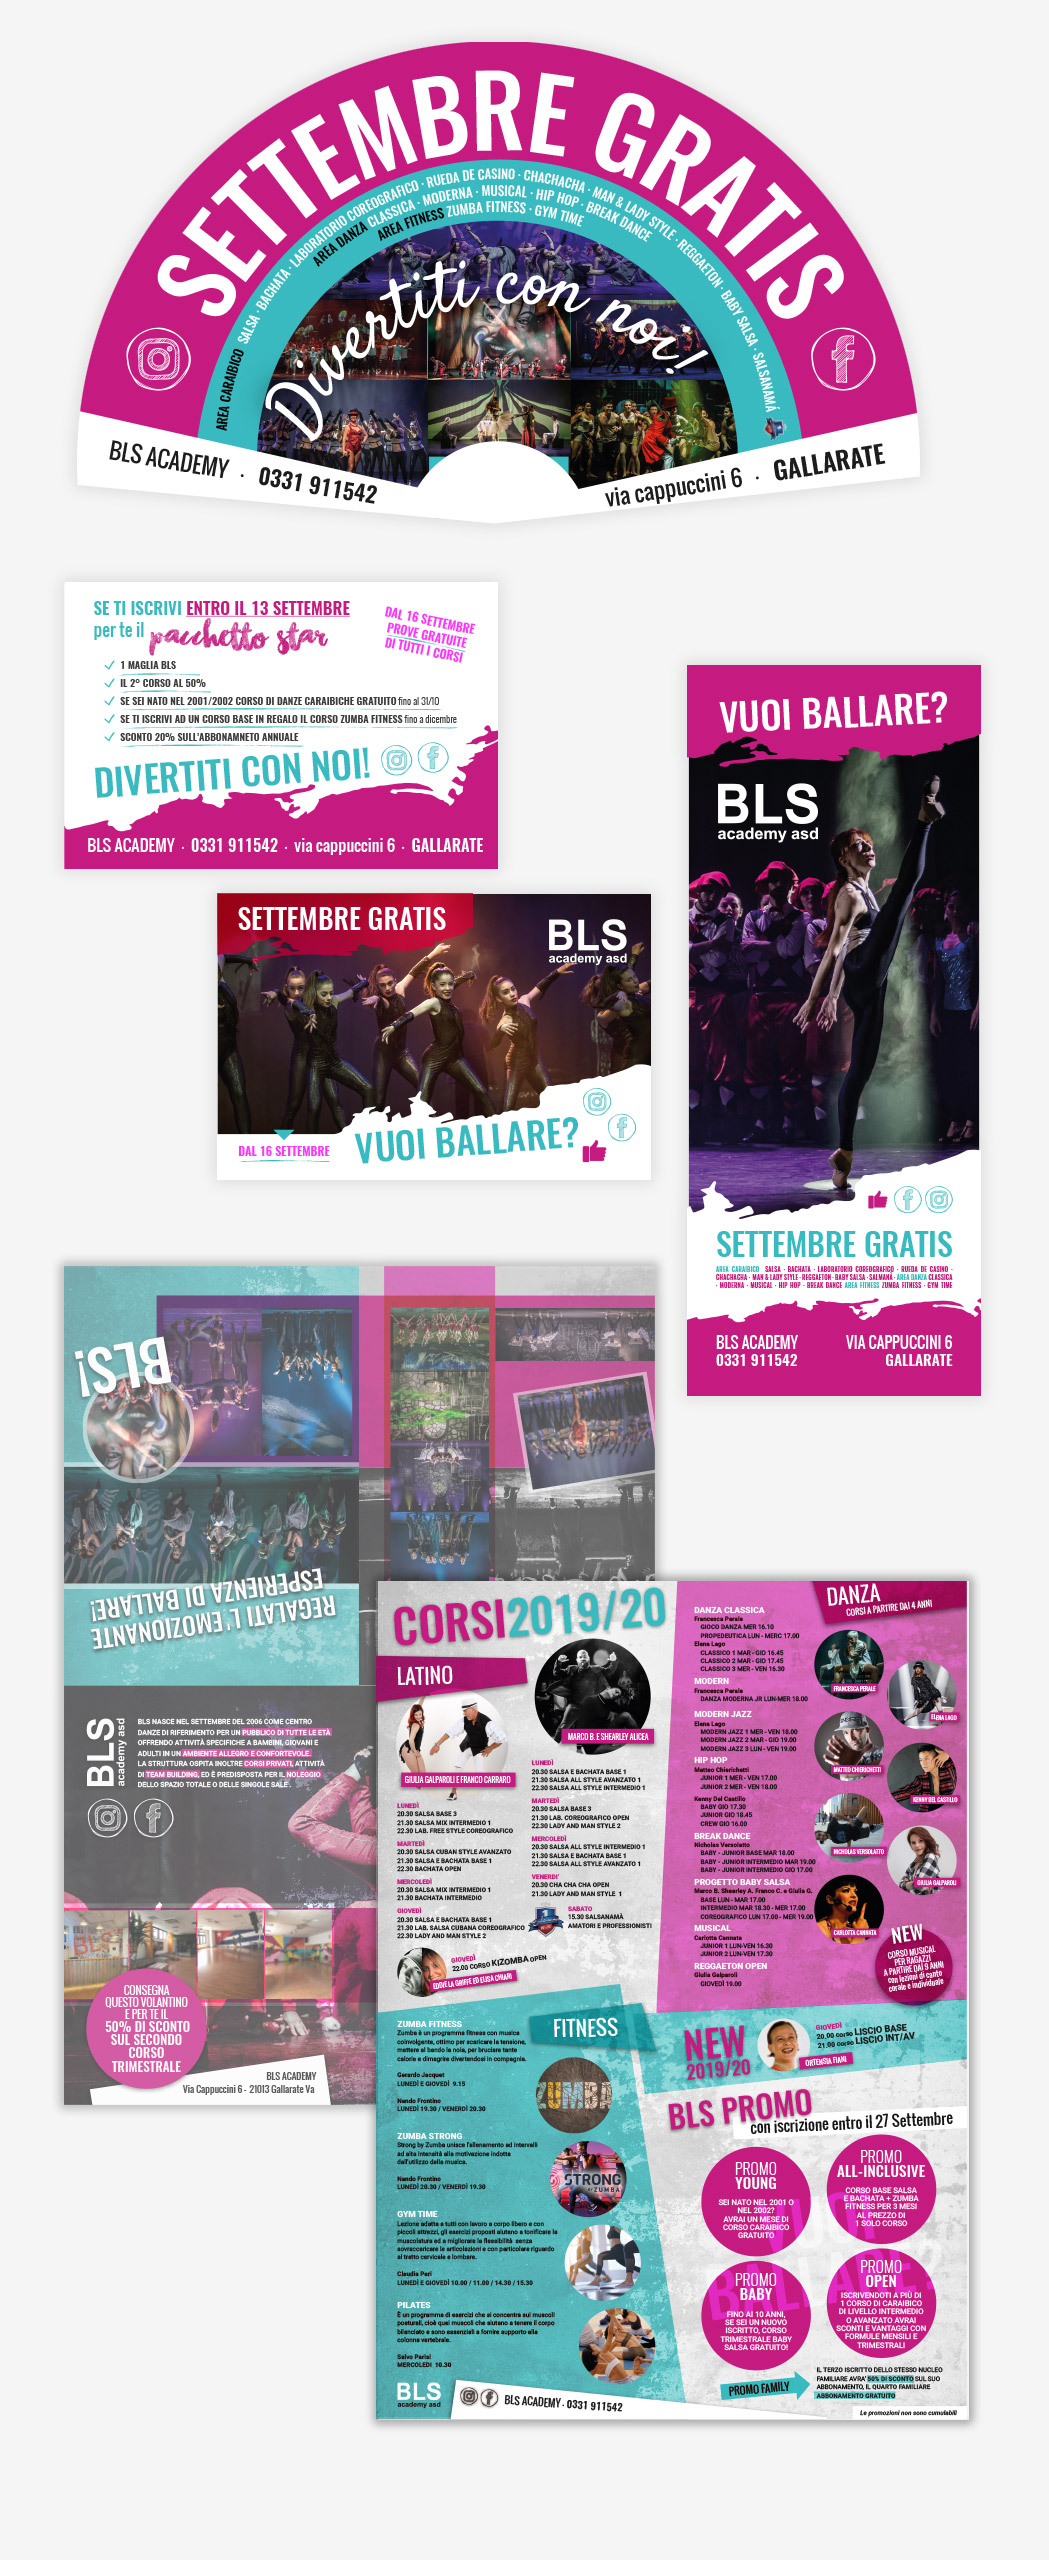 BLS academy portfolio